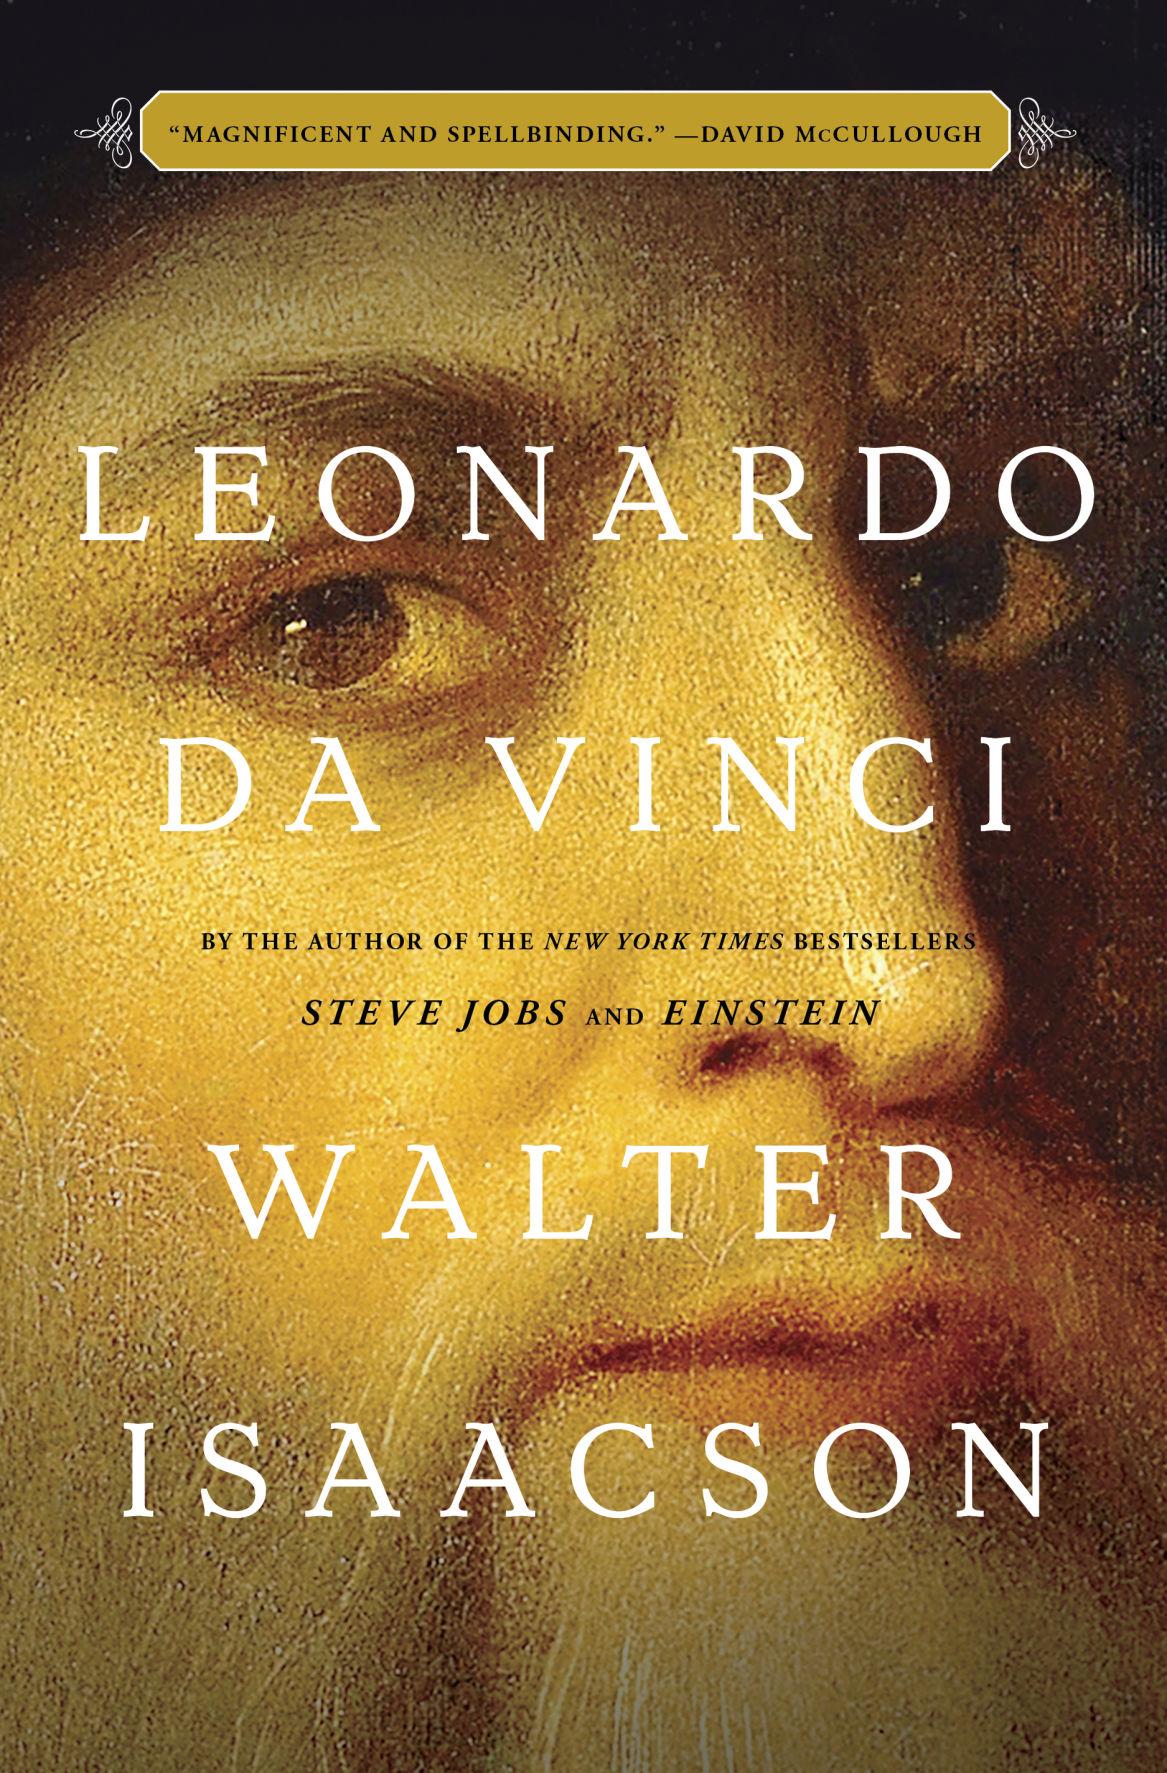 Books Walter Issacson